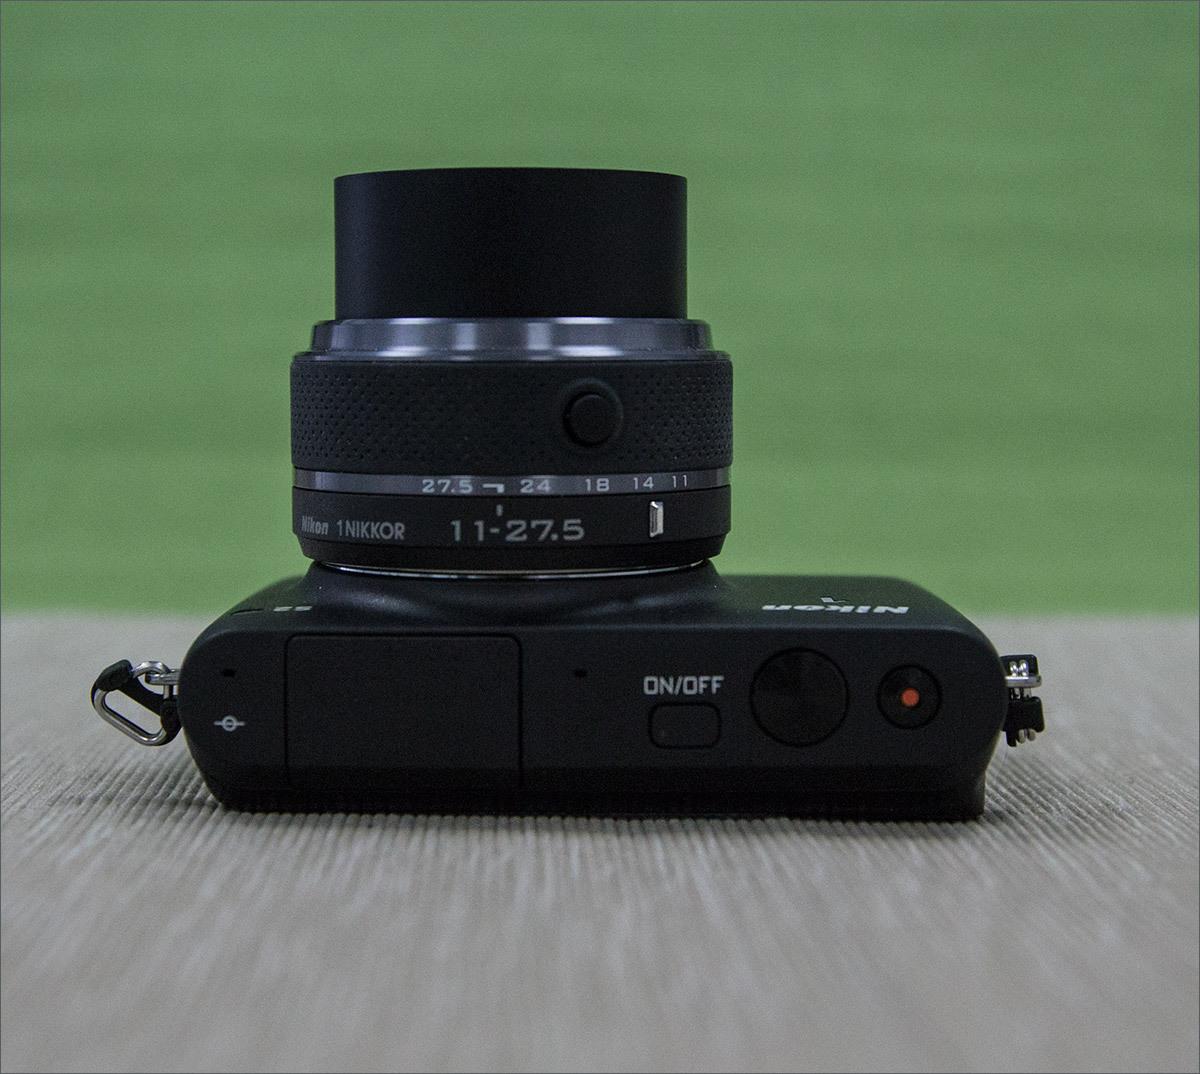 Asus FF-130F-1 Camera Driver for Windows